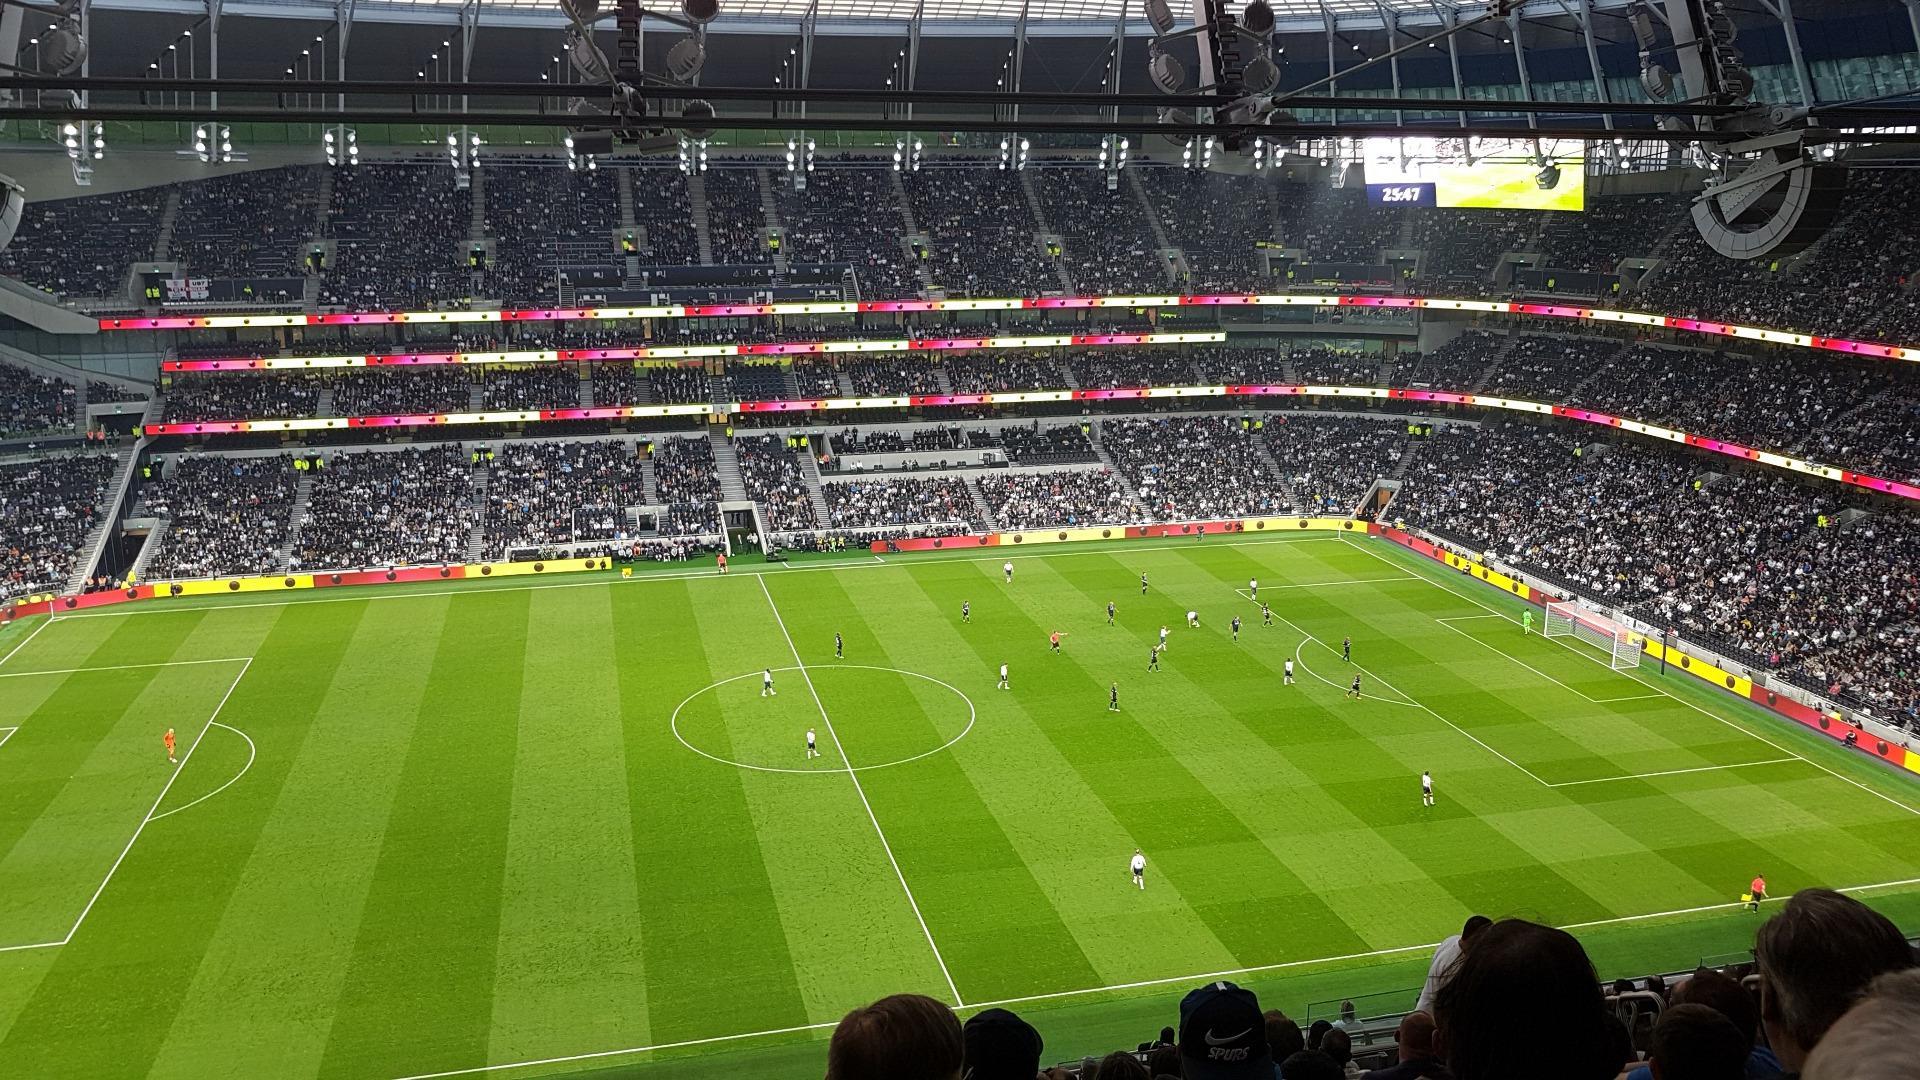 Tottenham Hotspur Stadium Secção 527 Fila 23